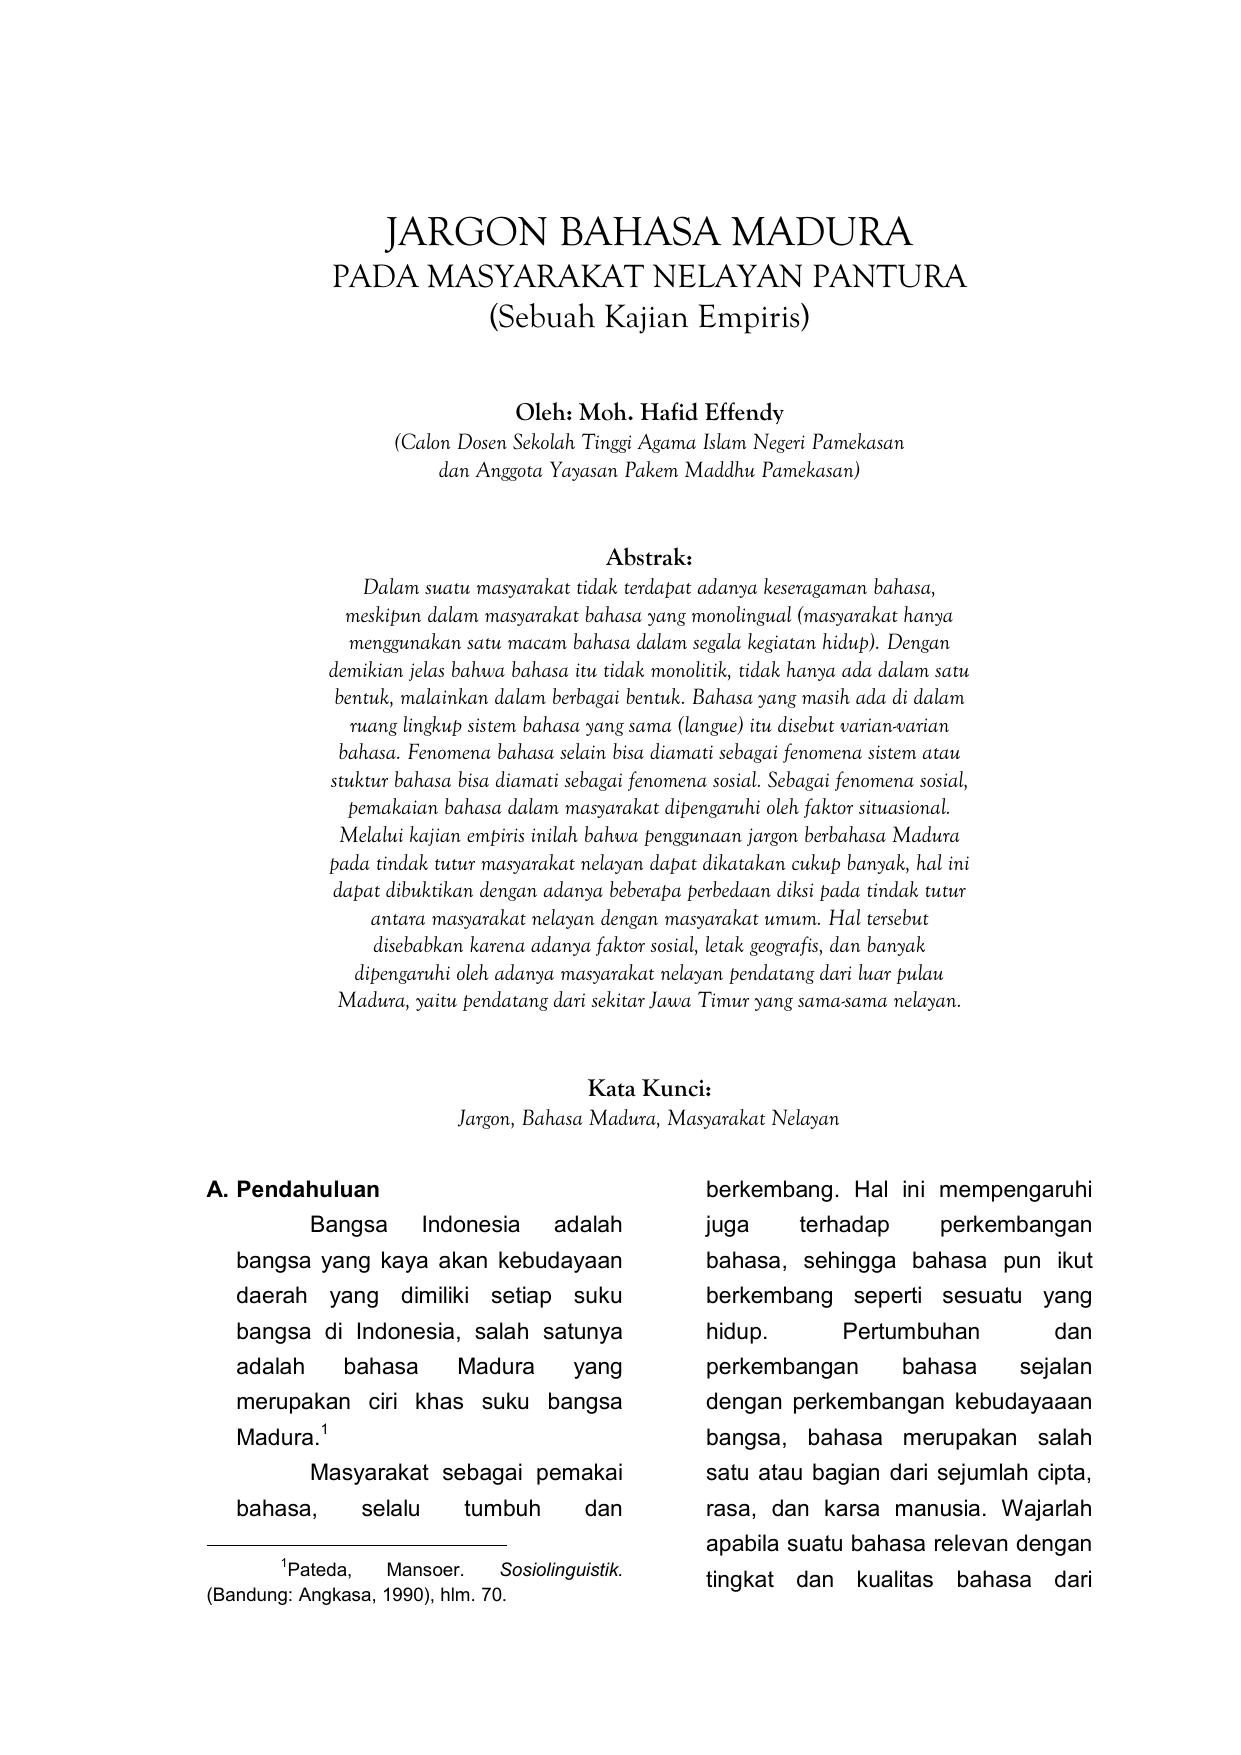 Jargon Bahasa Madura